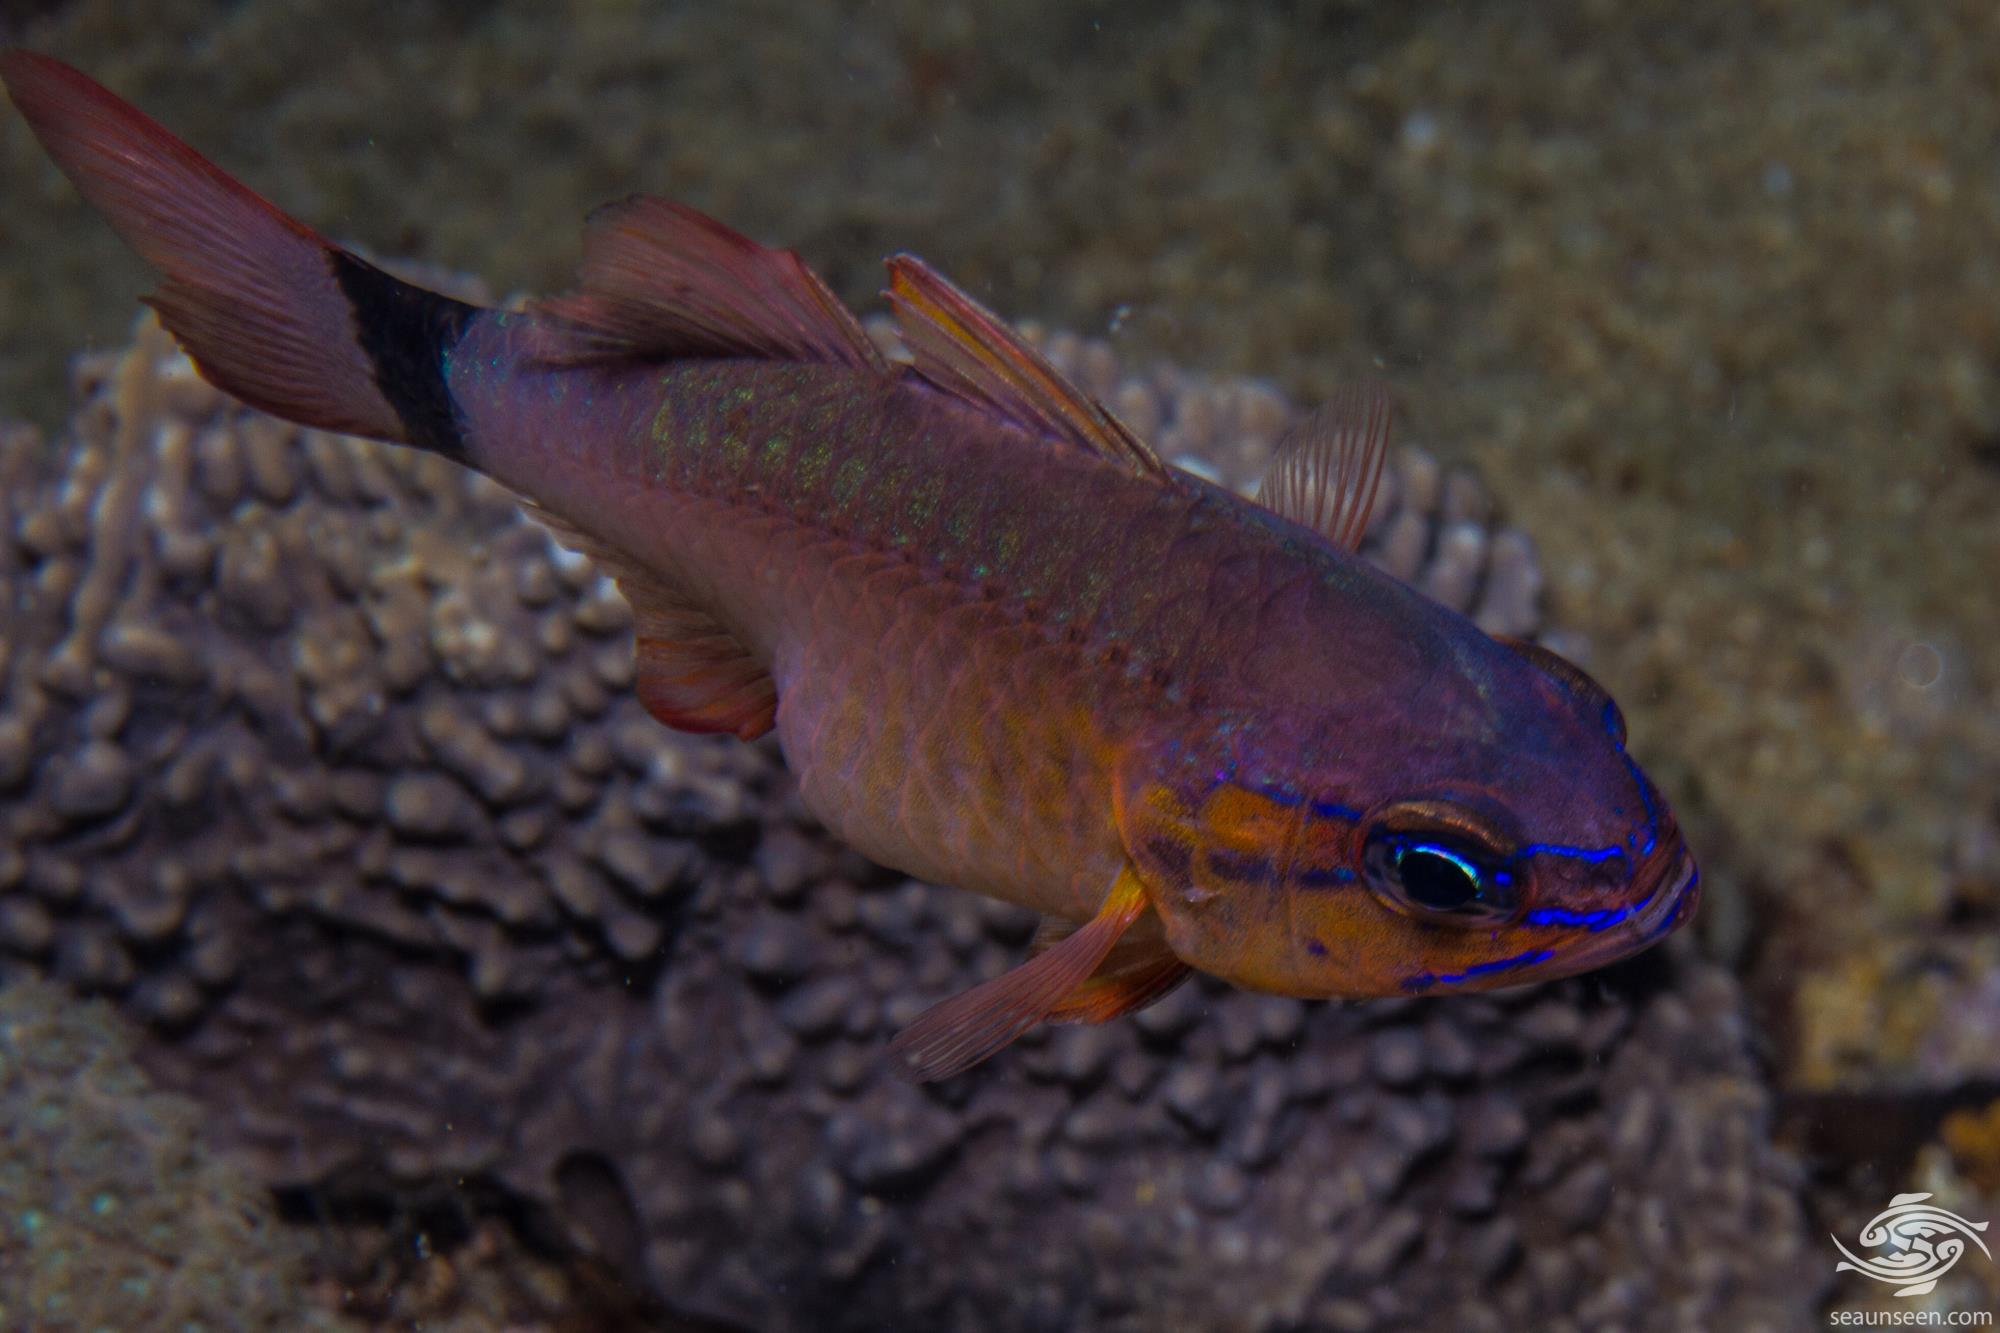 flower cardinalfish Apogon fleurieu is also known as the Bulls eye Cardinalfish and Ring tailed cardinalfish